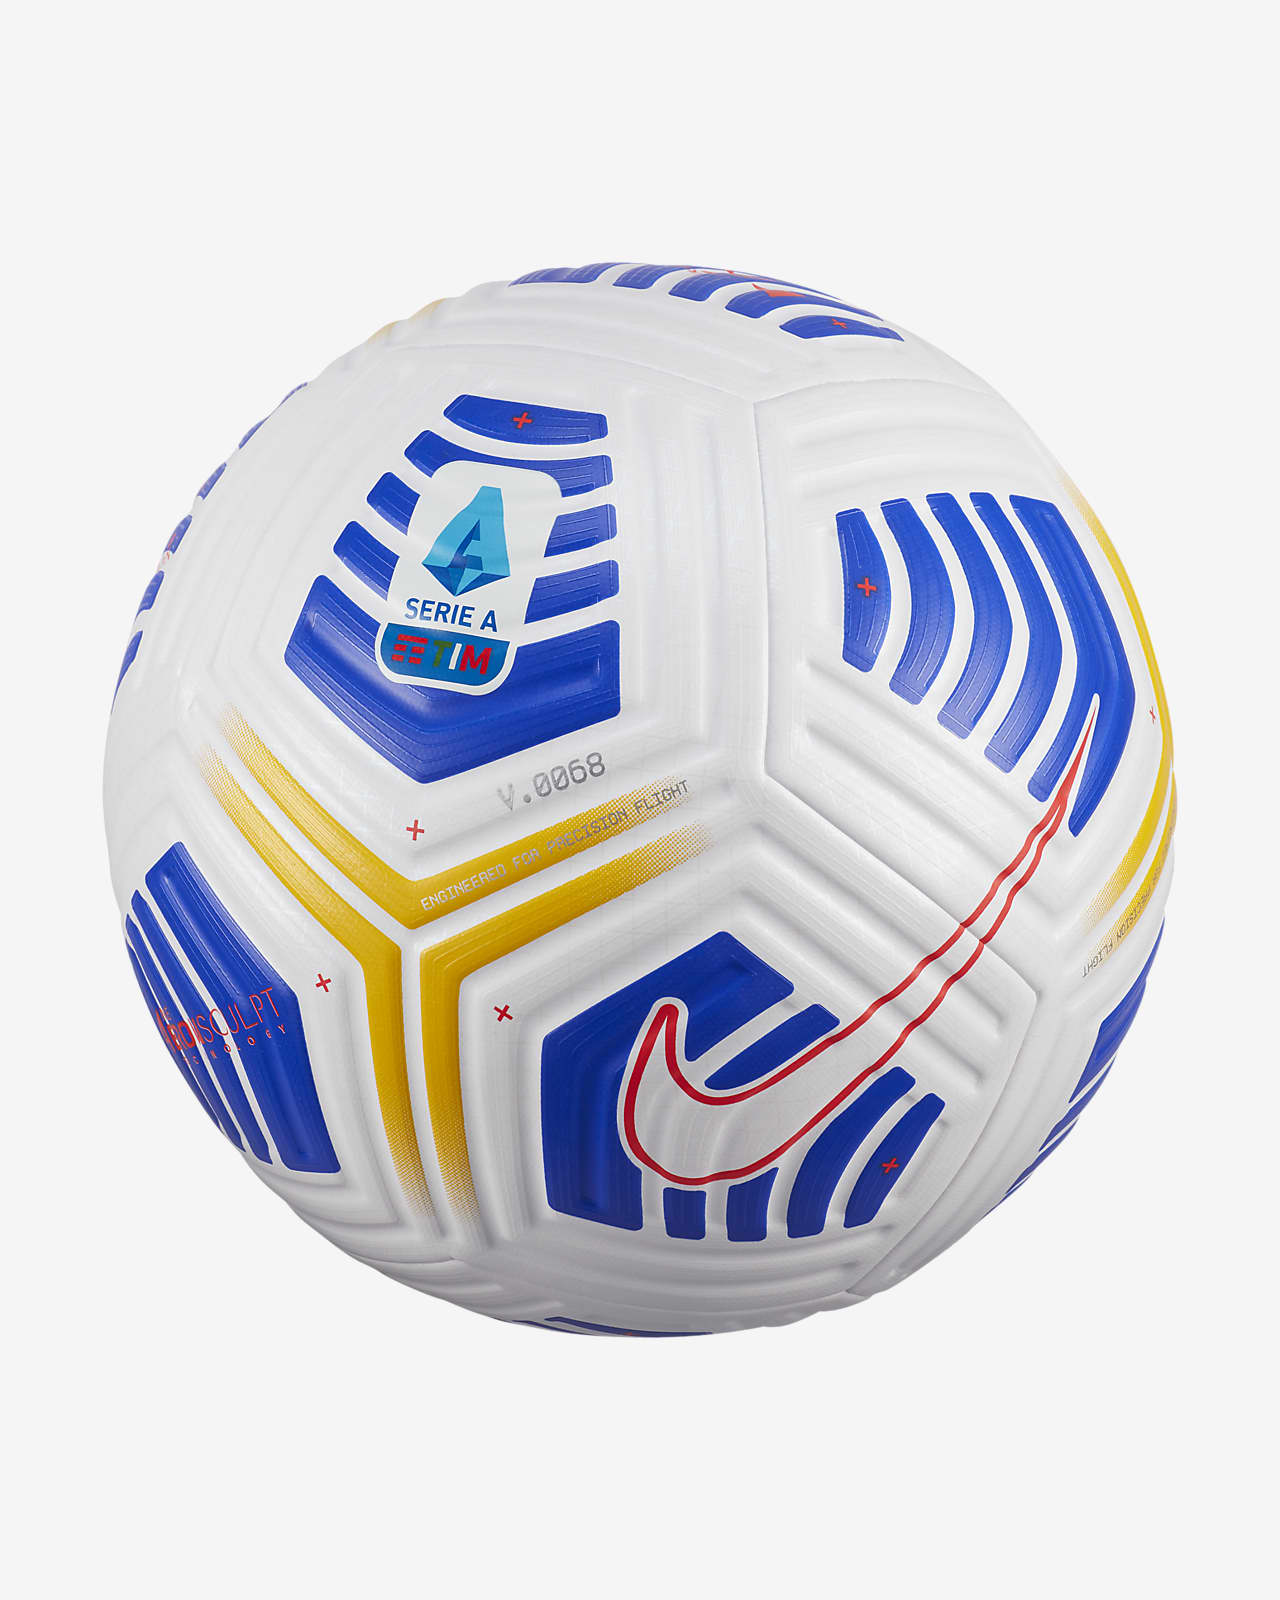 Serie A Flight Football Nike Lu